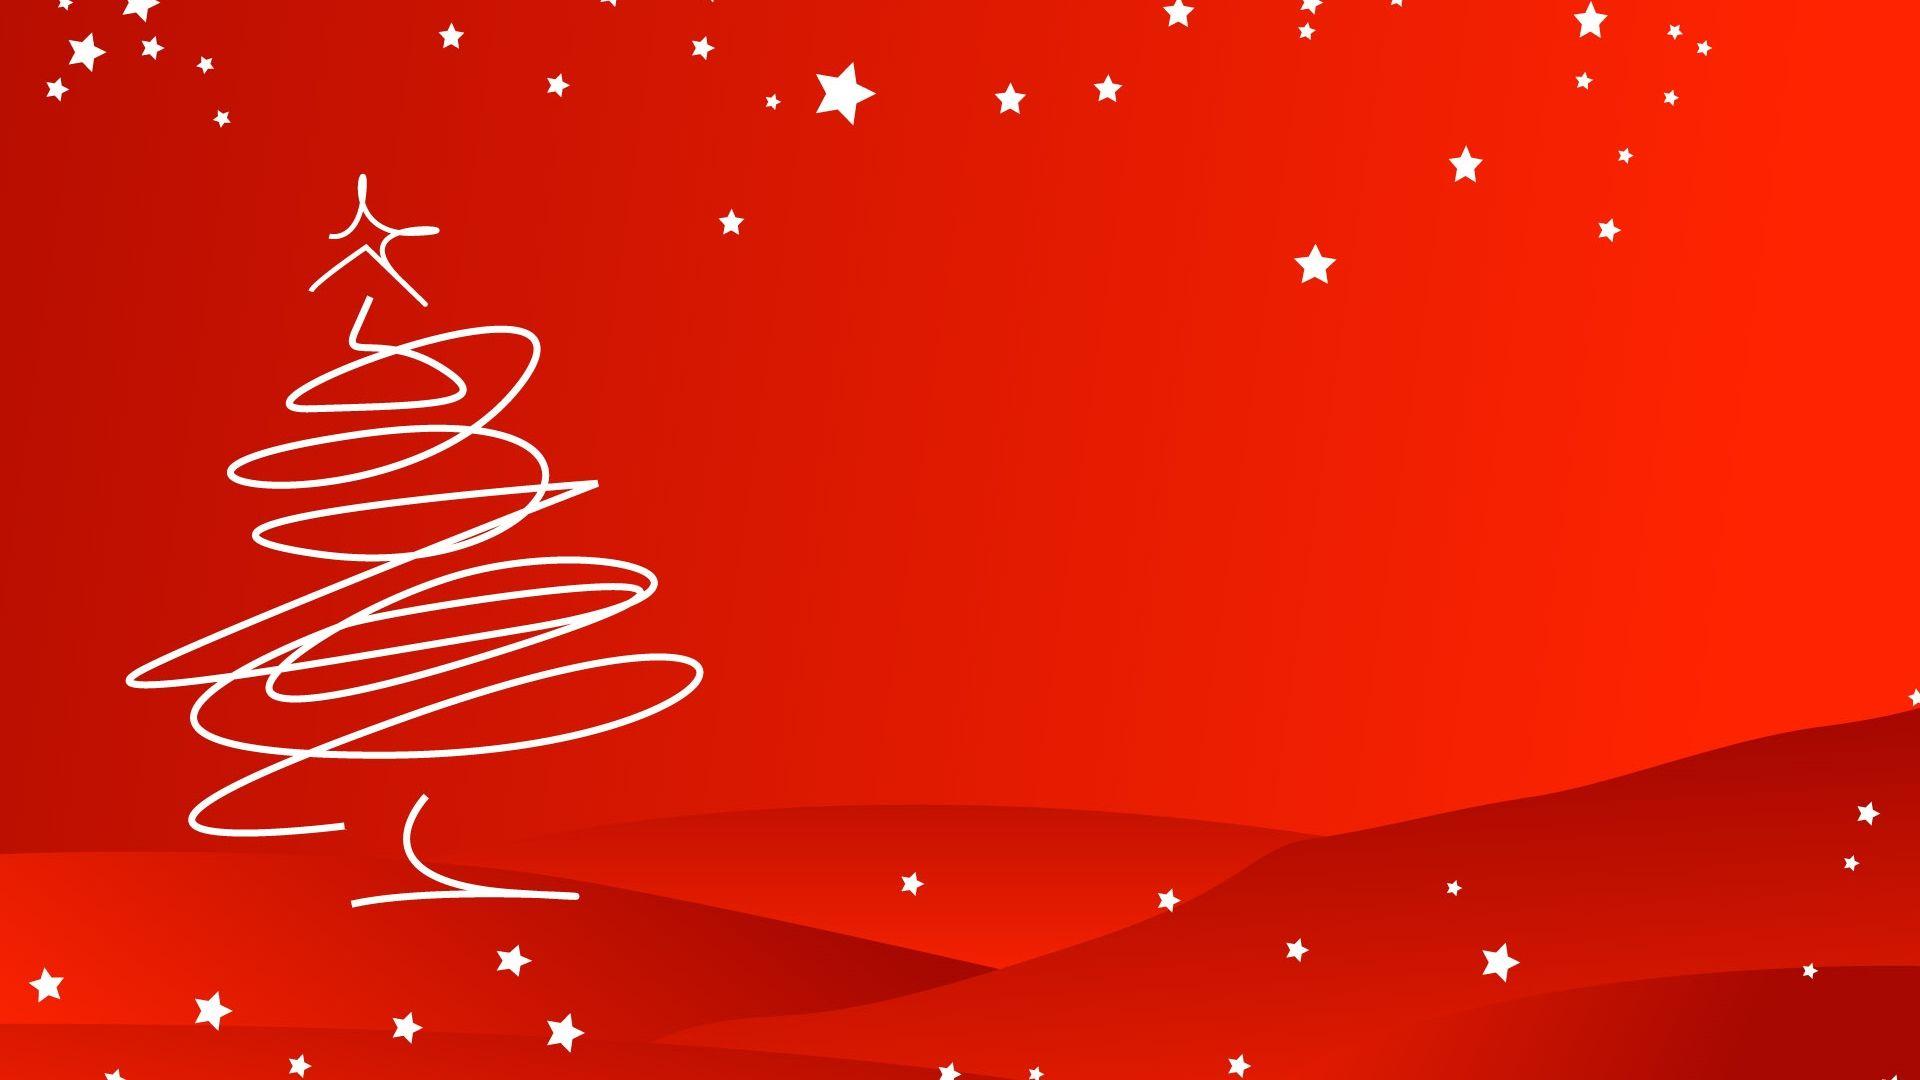 <b>Christmas Wallpaper Wallpapers High</b>